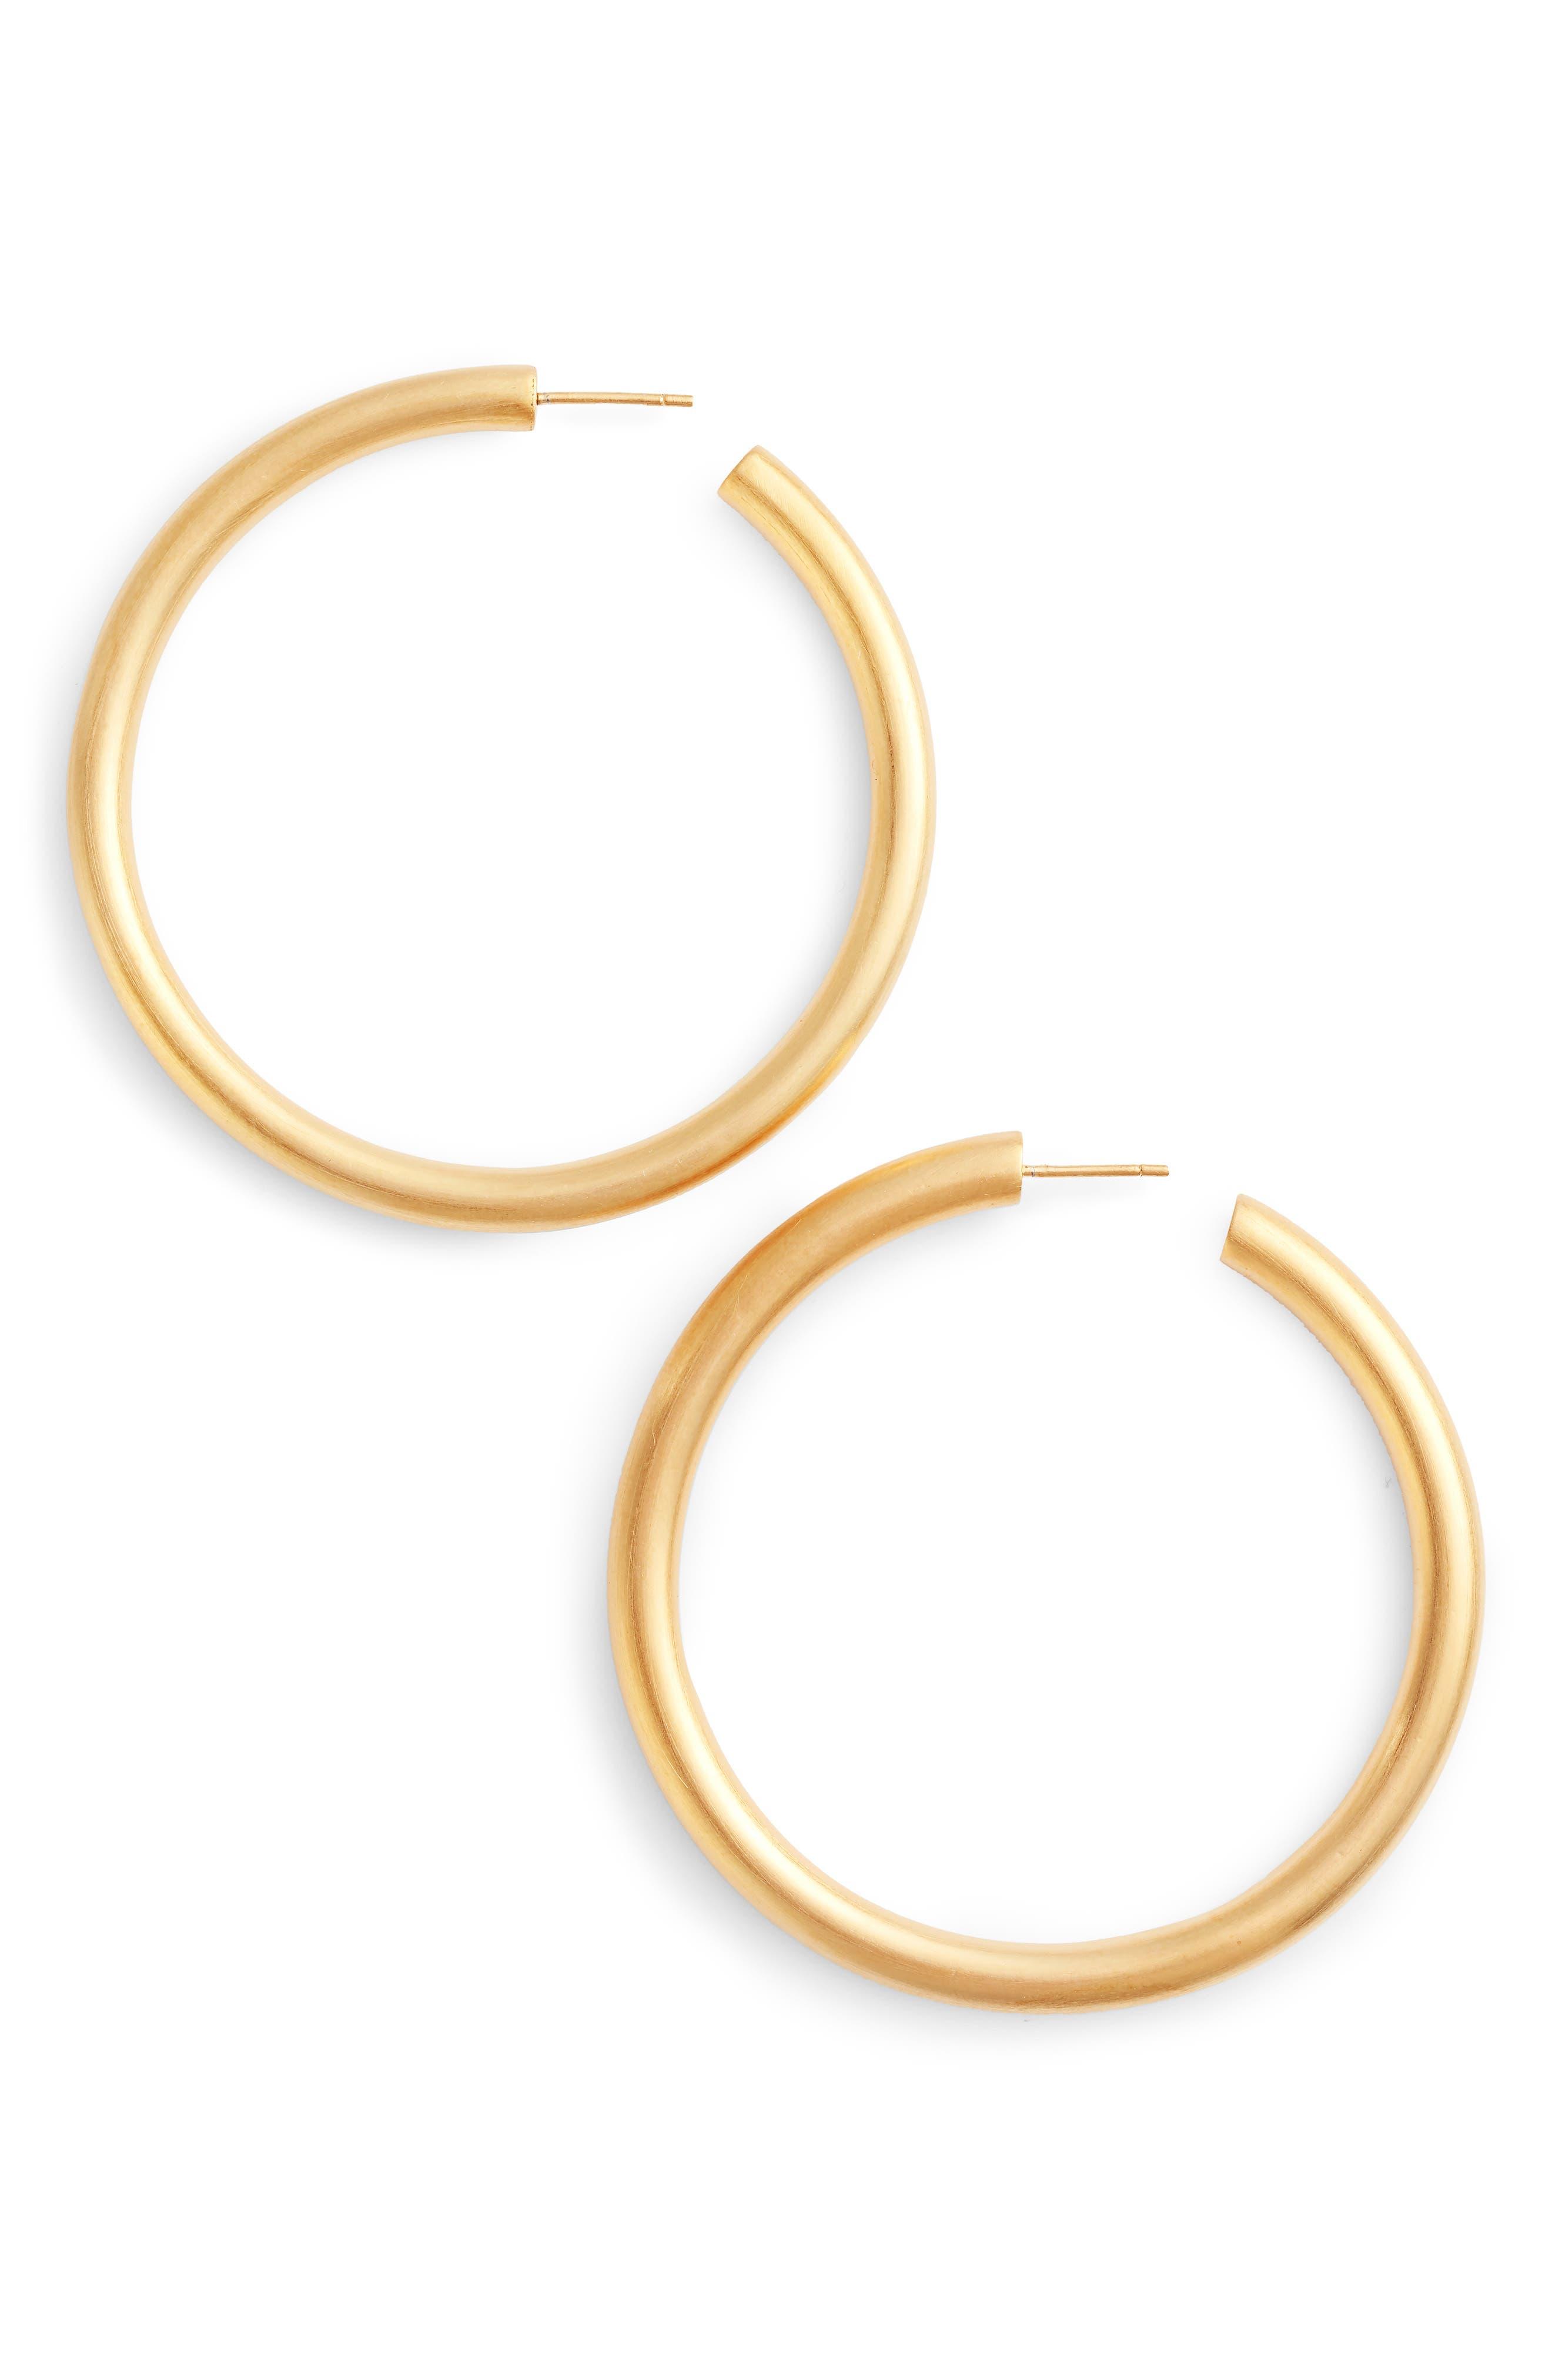 Ipanema Hoop Earrings,                             Main thumbnail 1, color,                             Gold